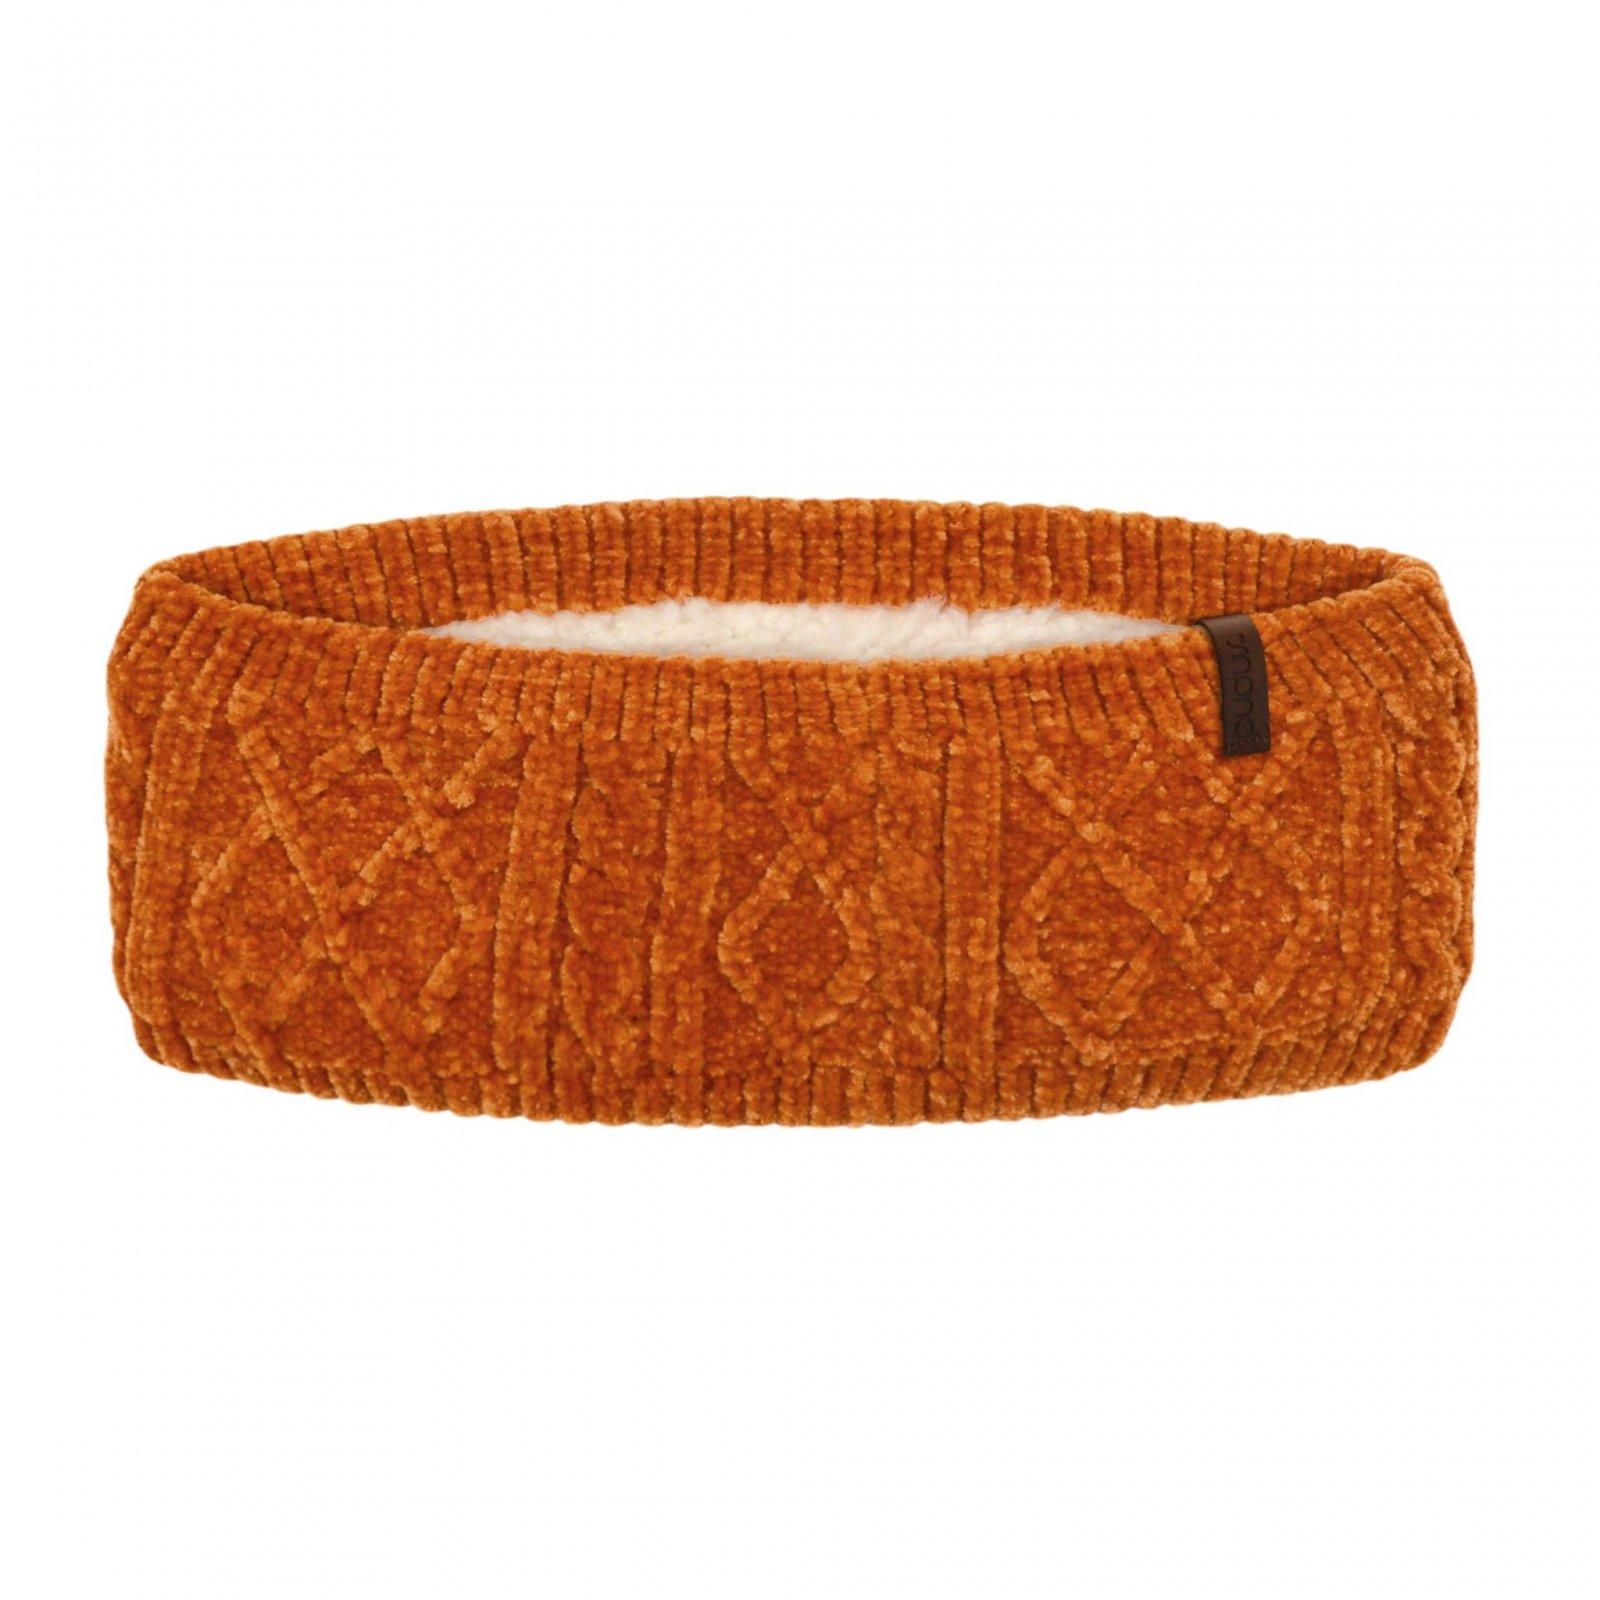 Chenille Knit Headband   Peach Caramel